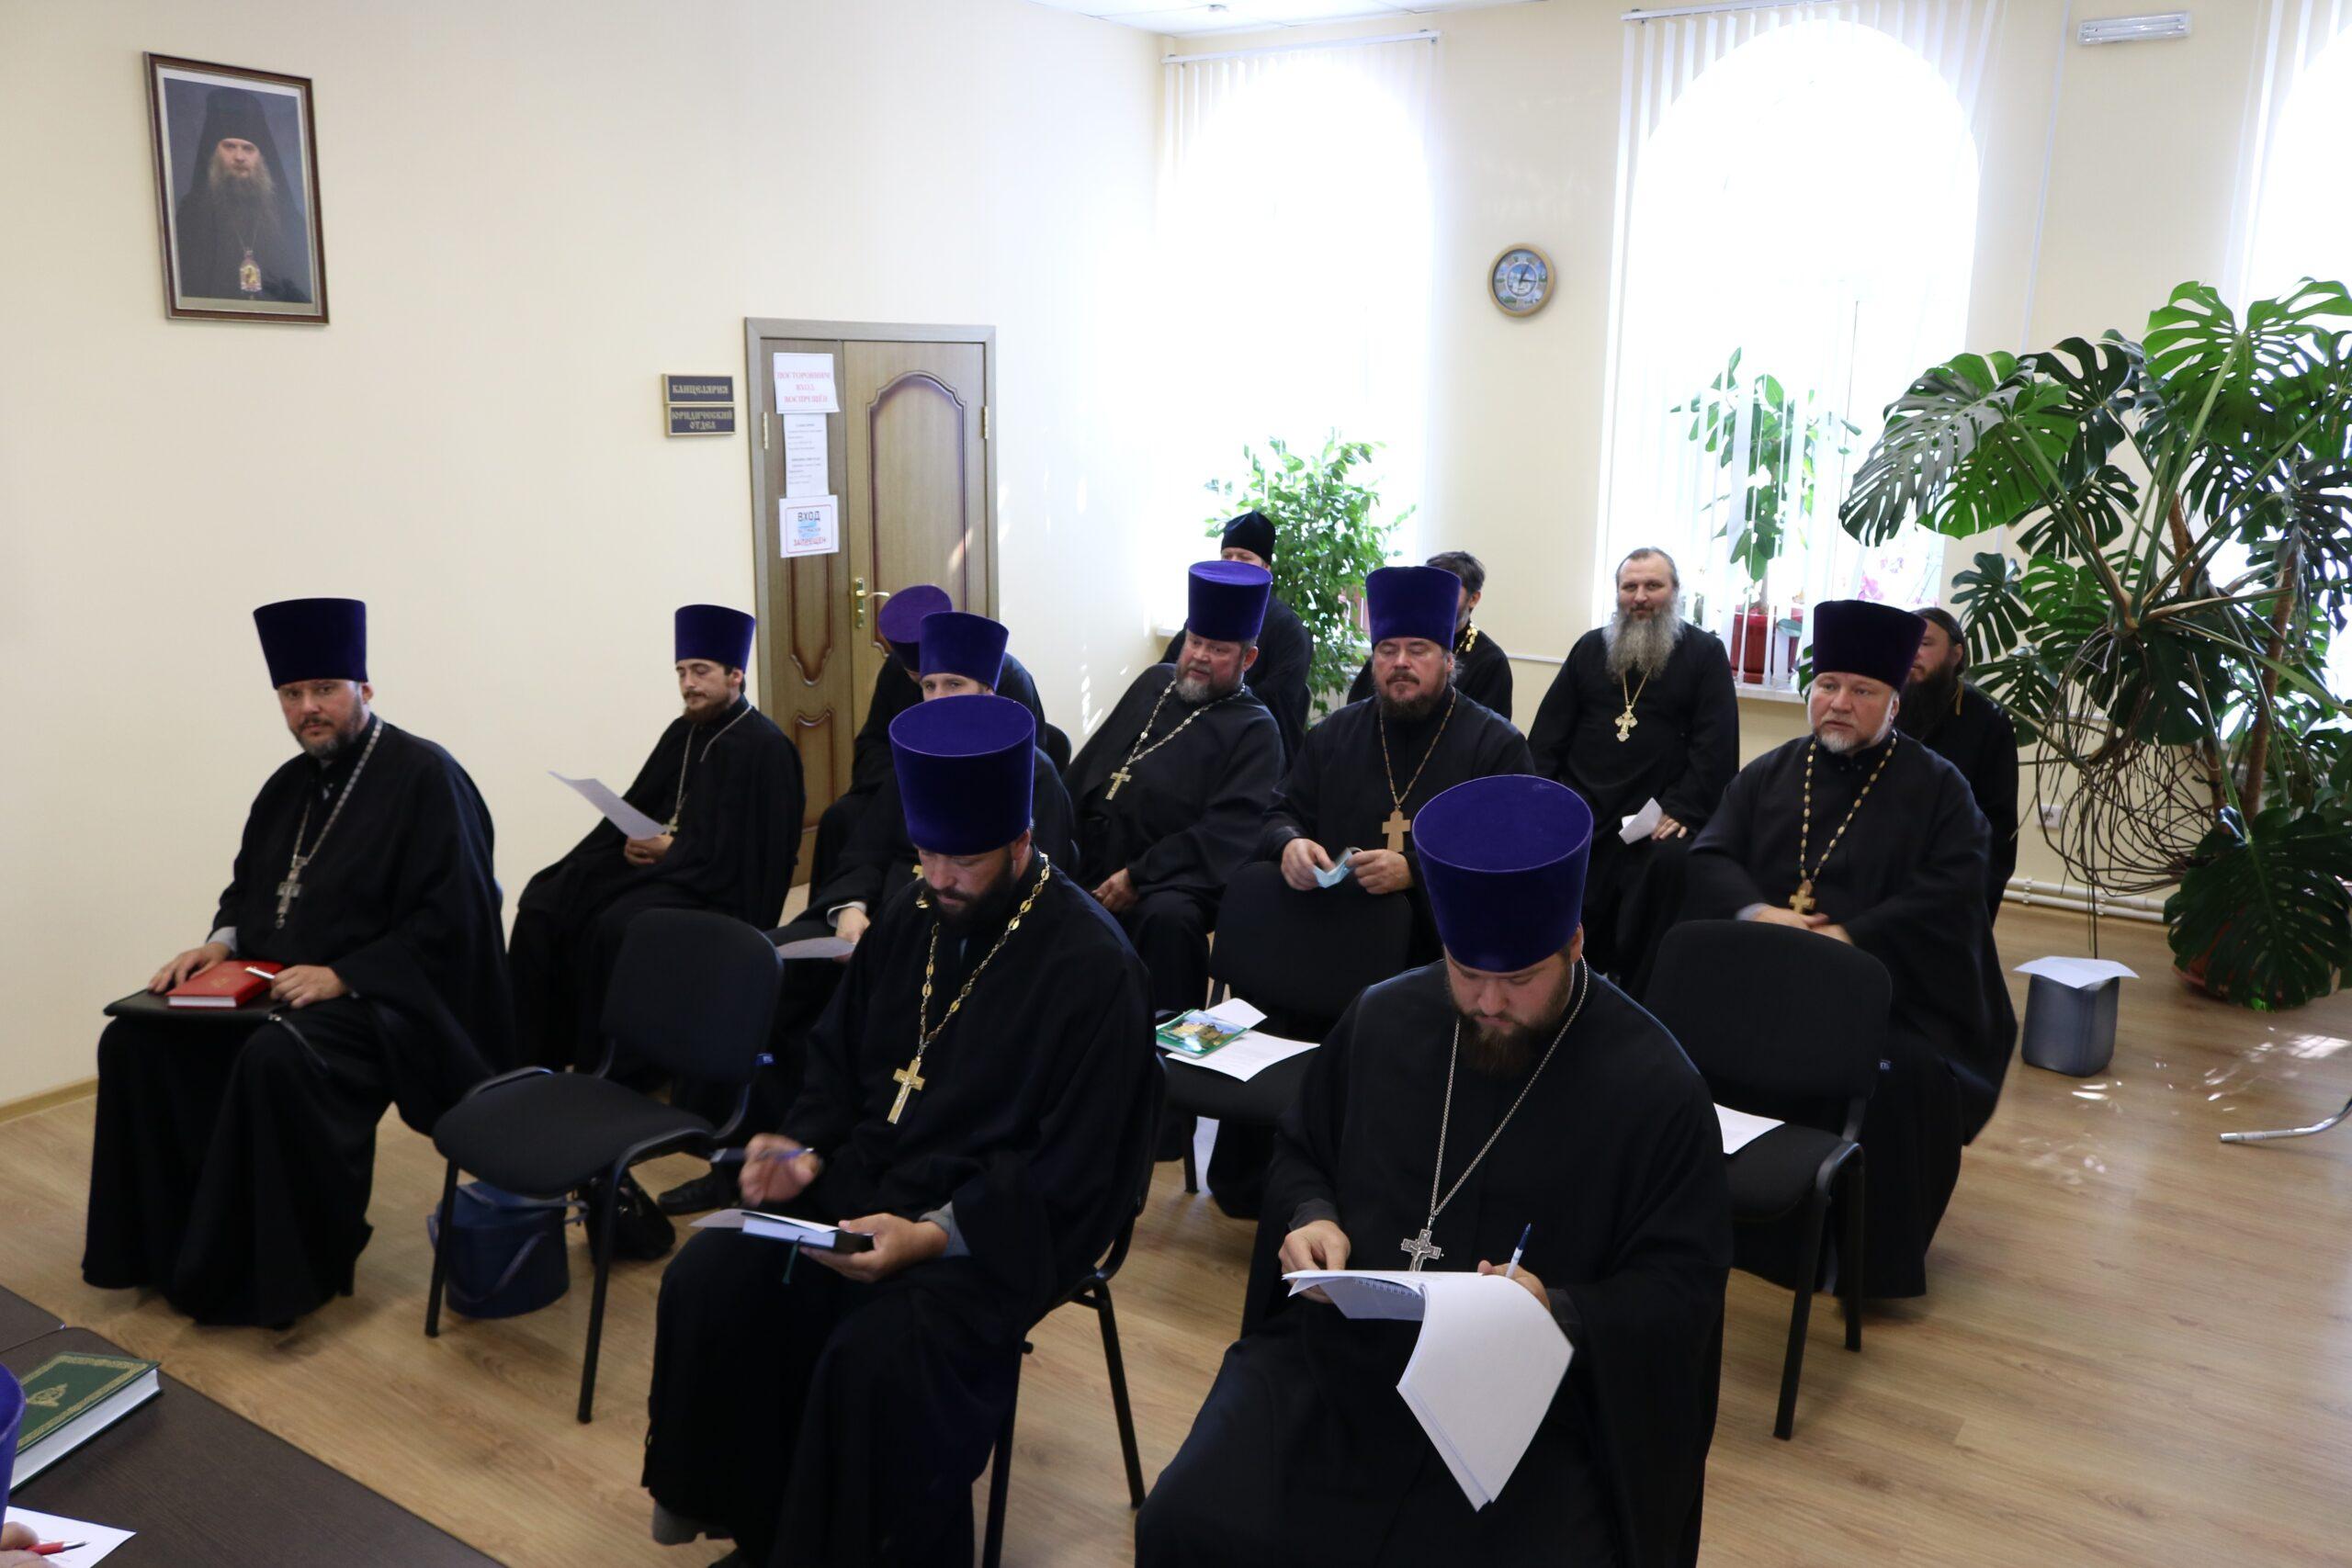 Епархия трира — википедия. что такое епархия трира